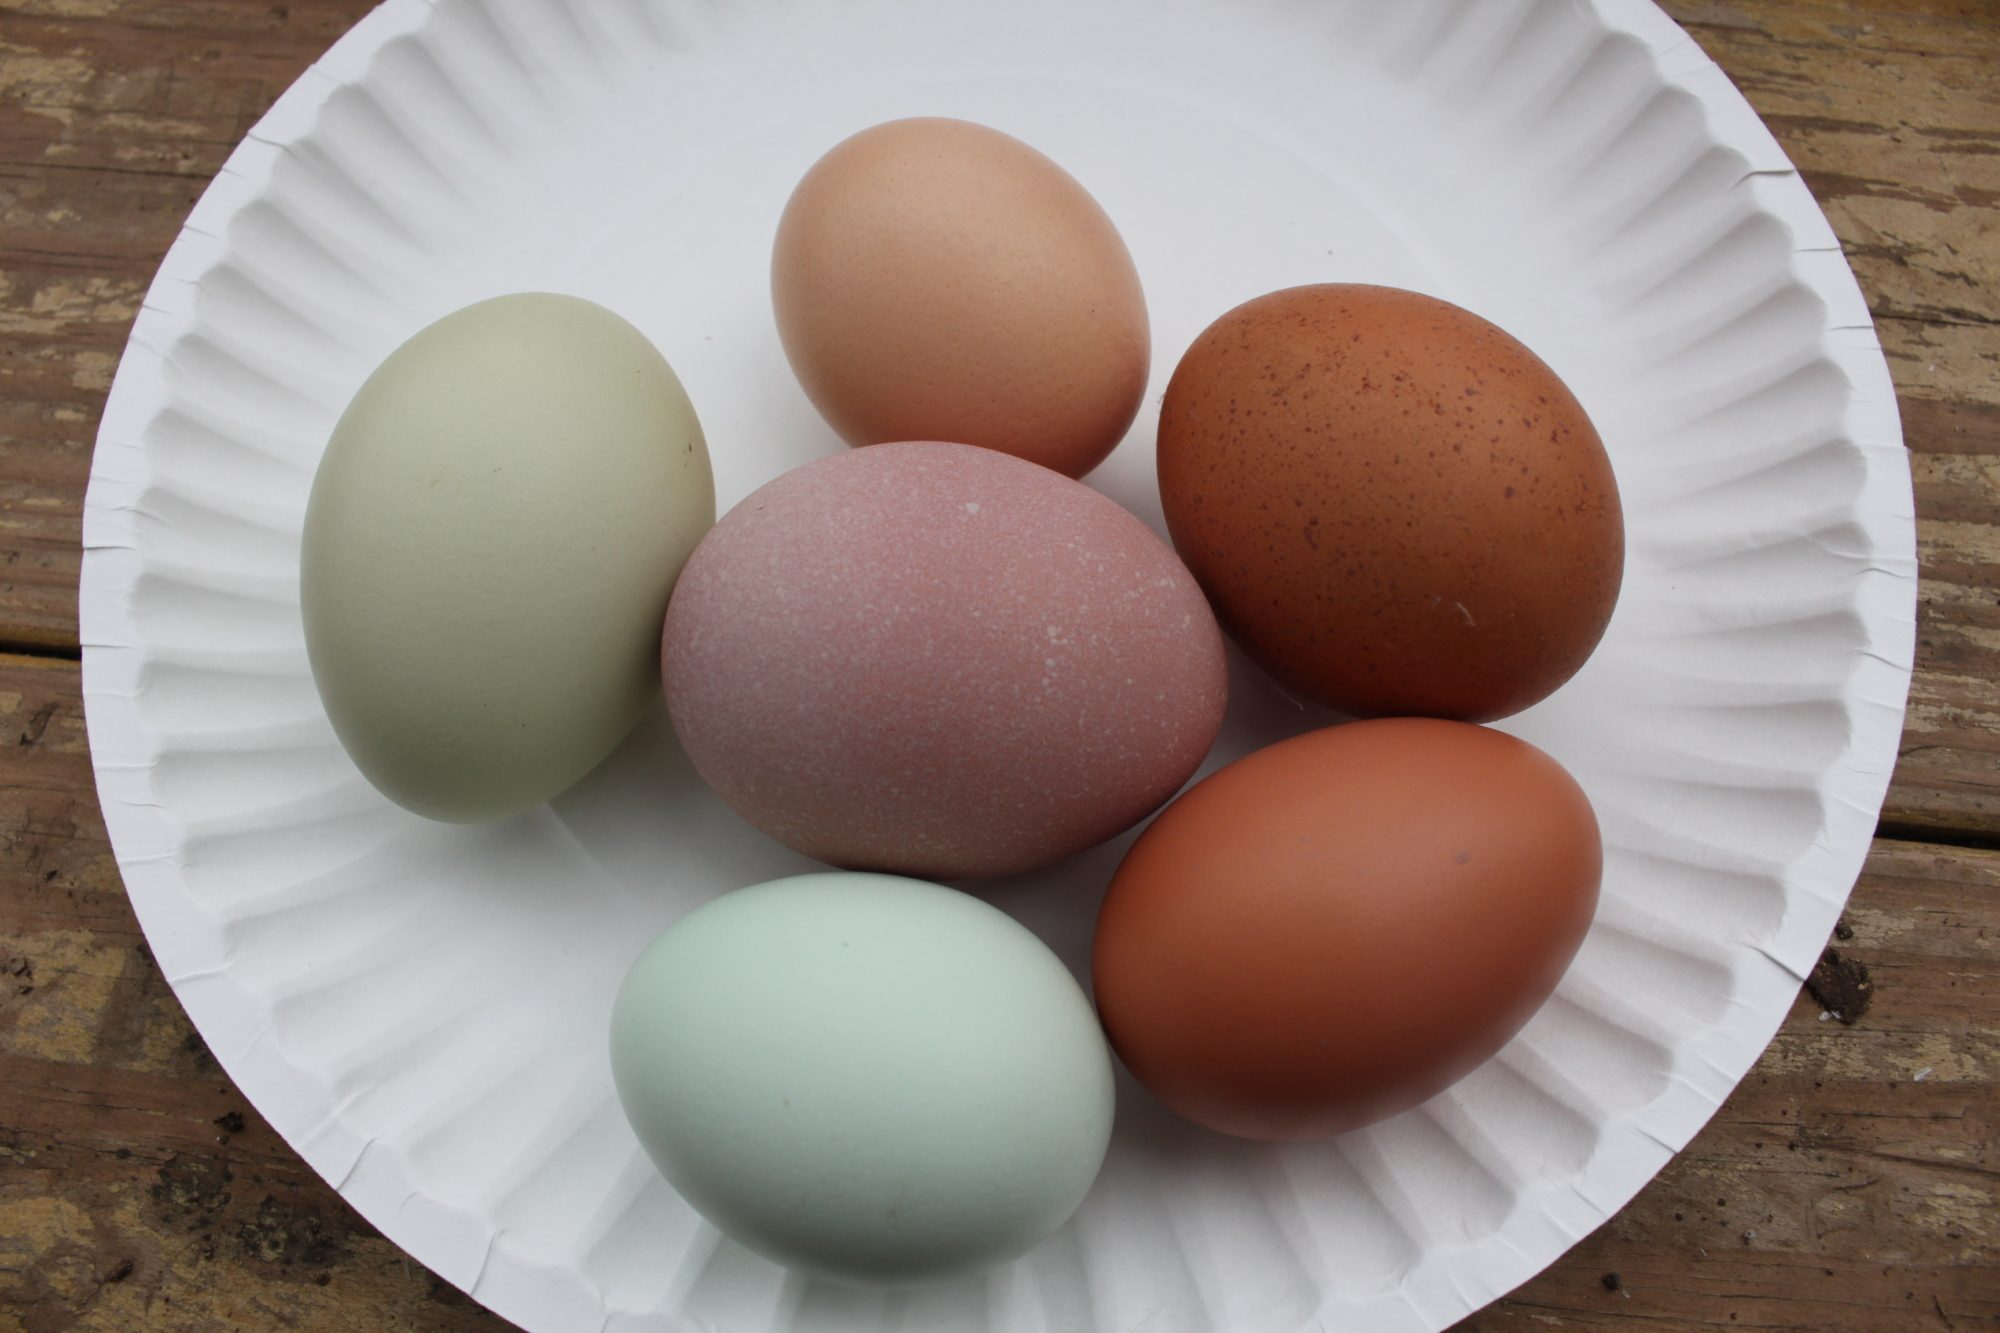 purple marans egg backyard chickens